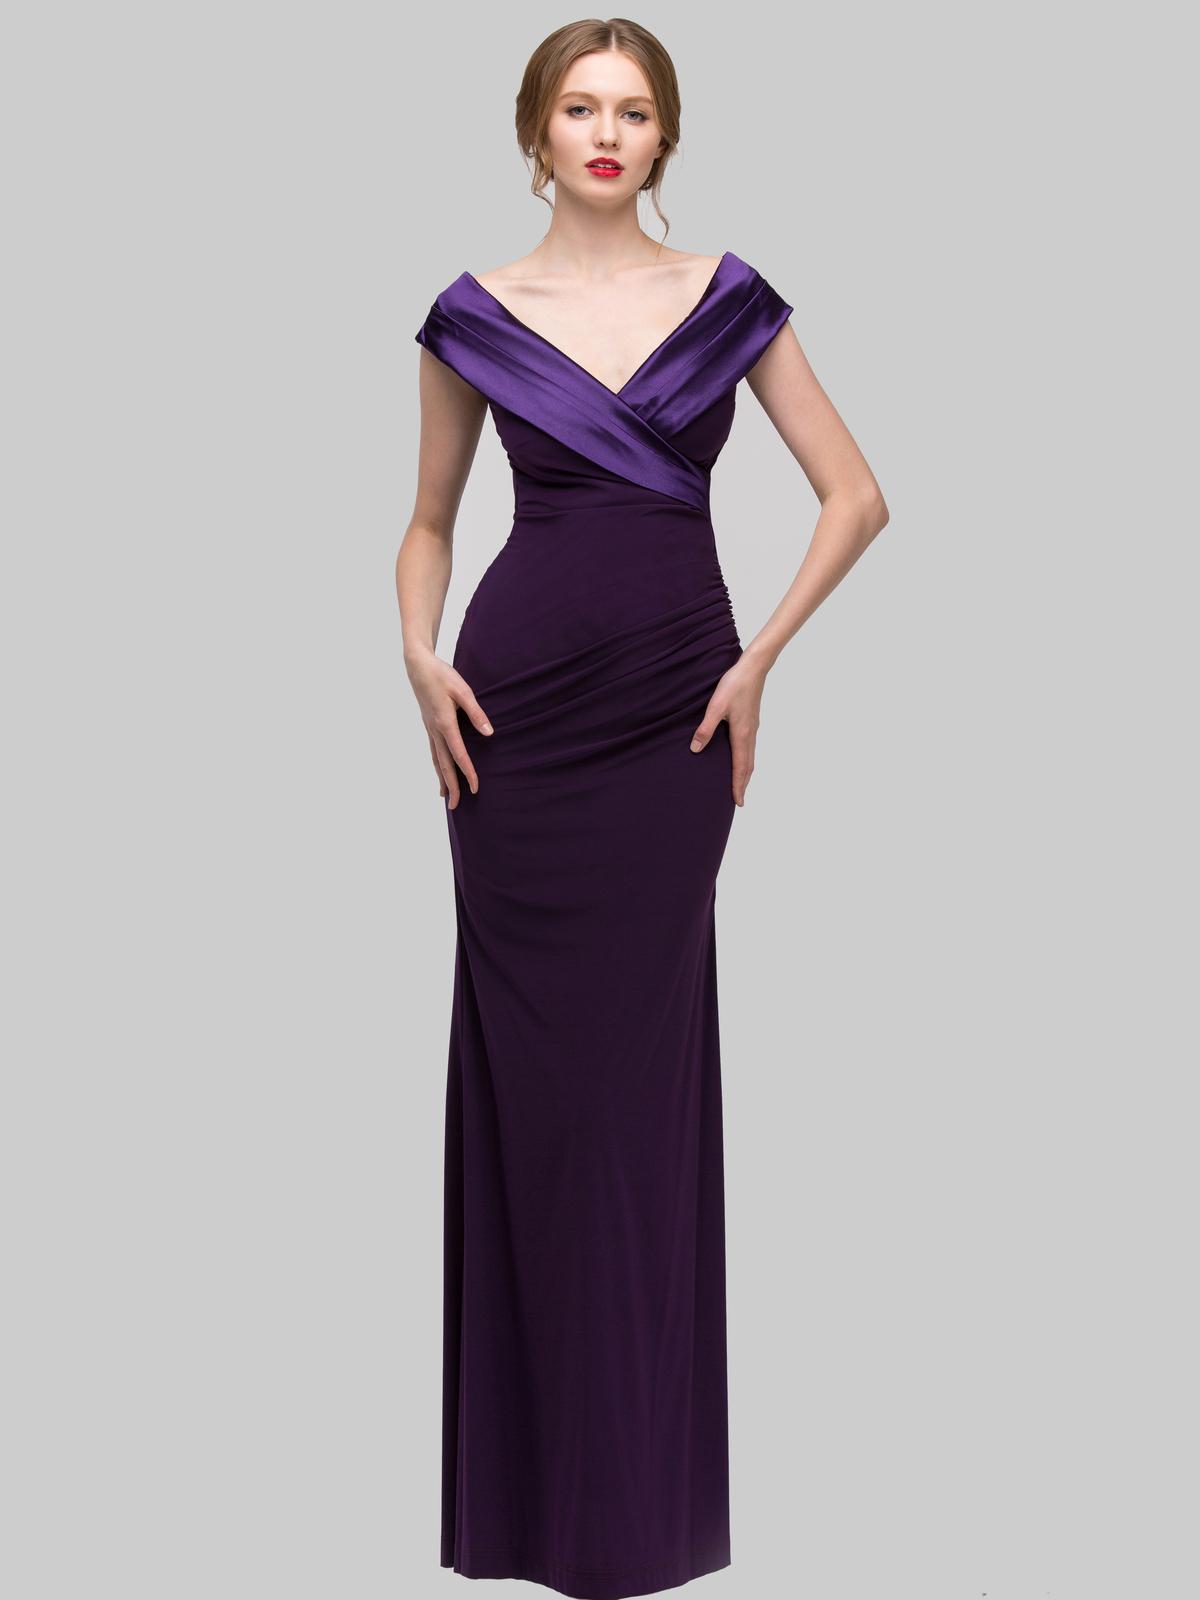 Timeless Evening Dresses